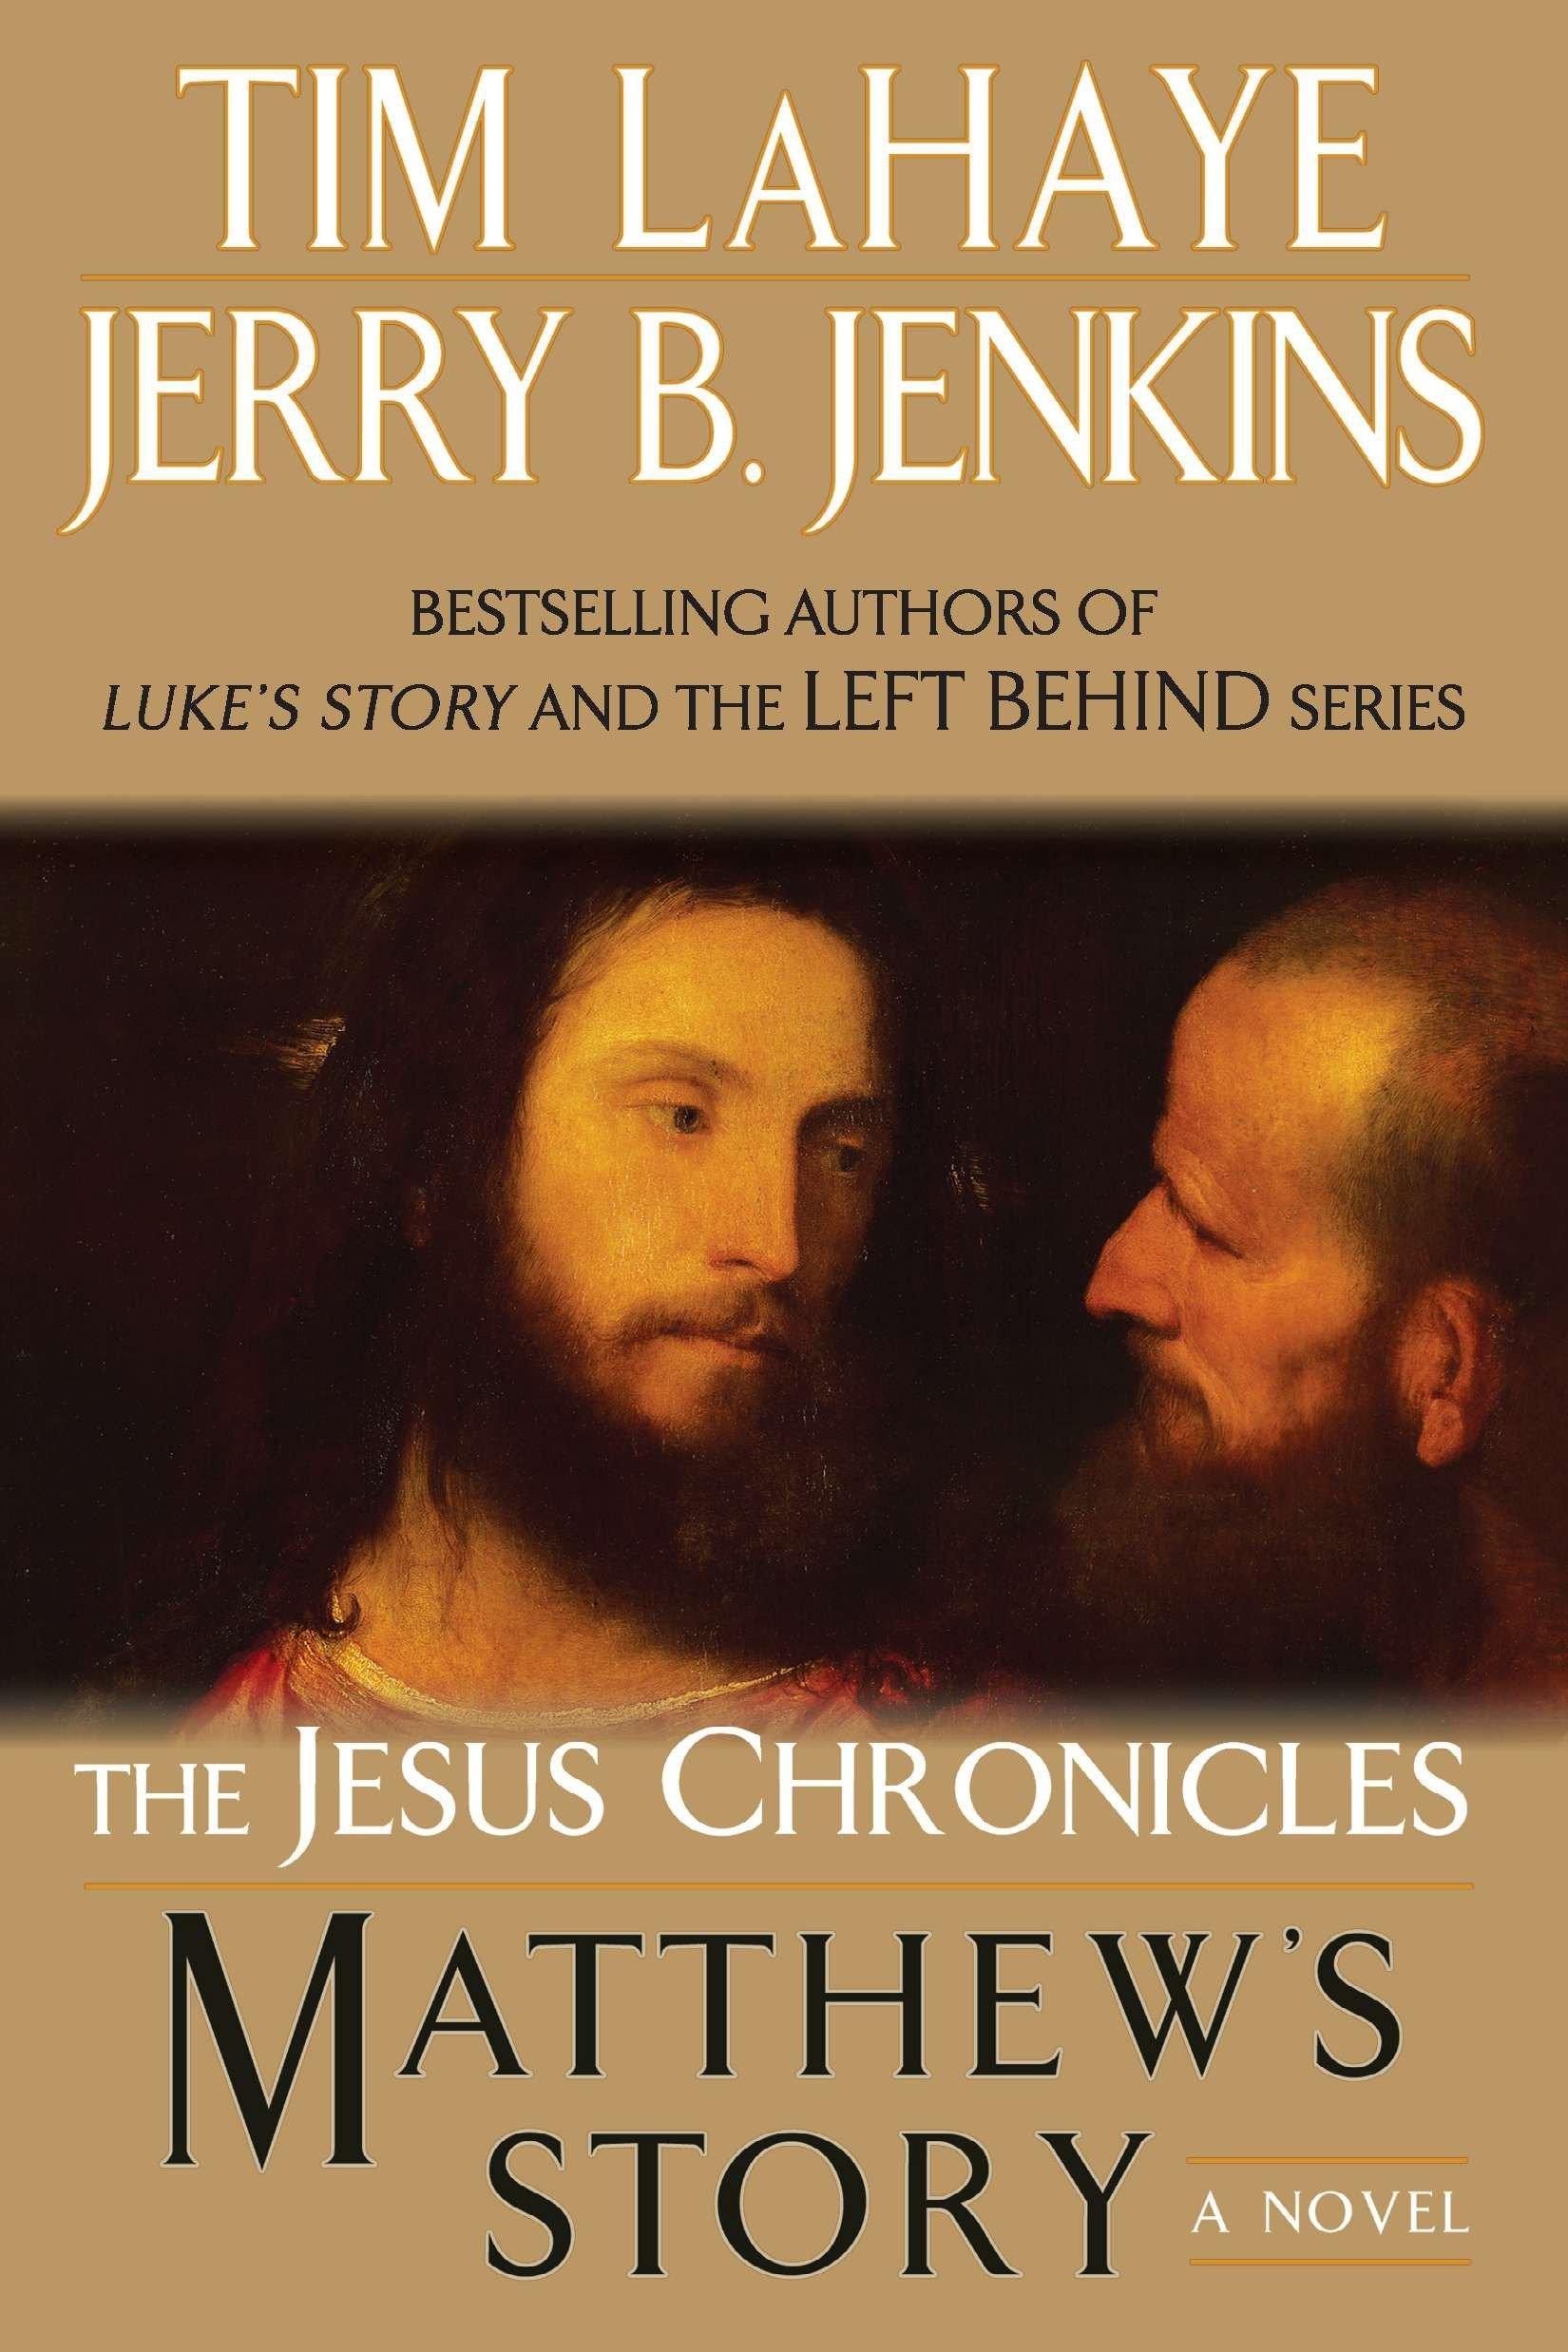 Matthew S Story The Jesus Chronicles 9780425238684 Lahaye Tim Jenkins Jerry B Books